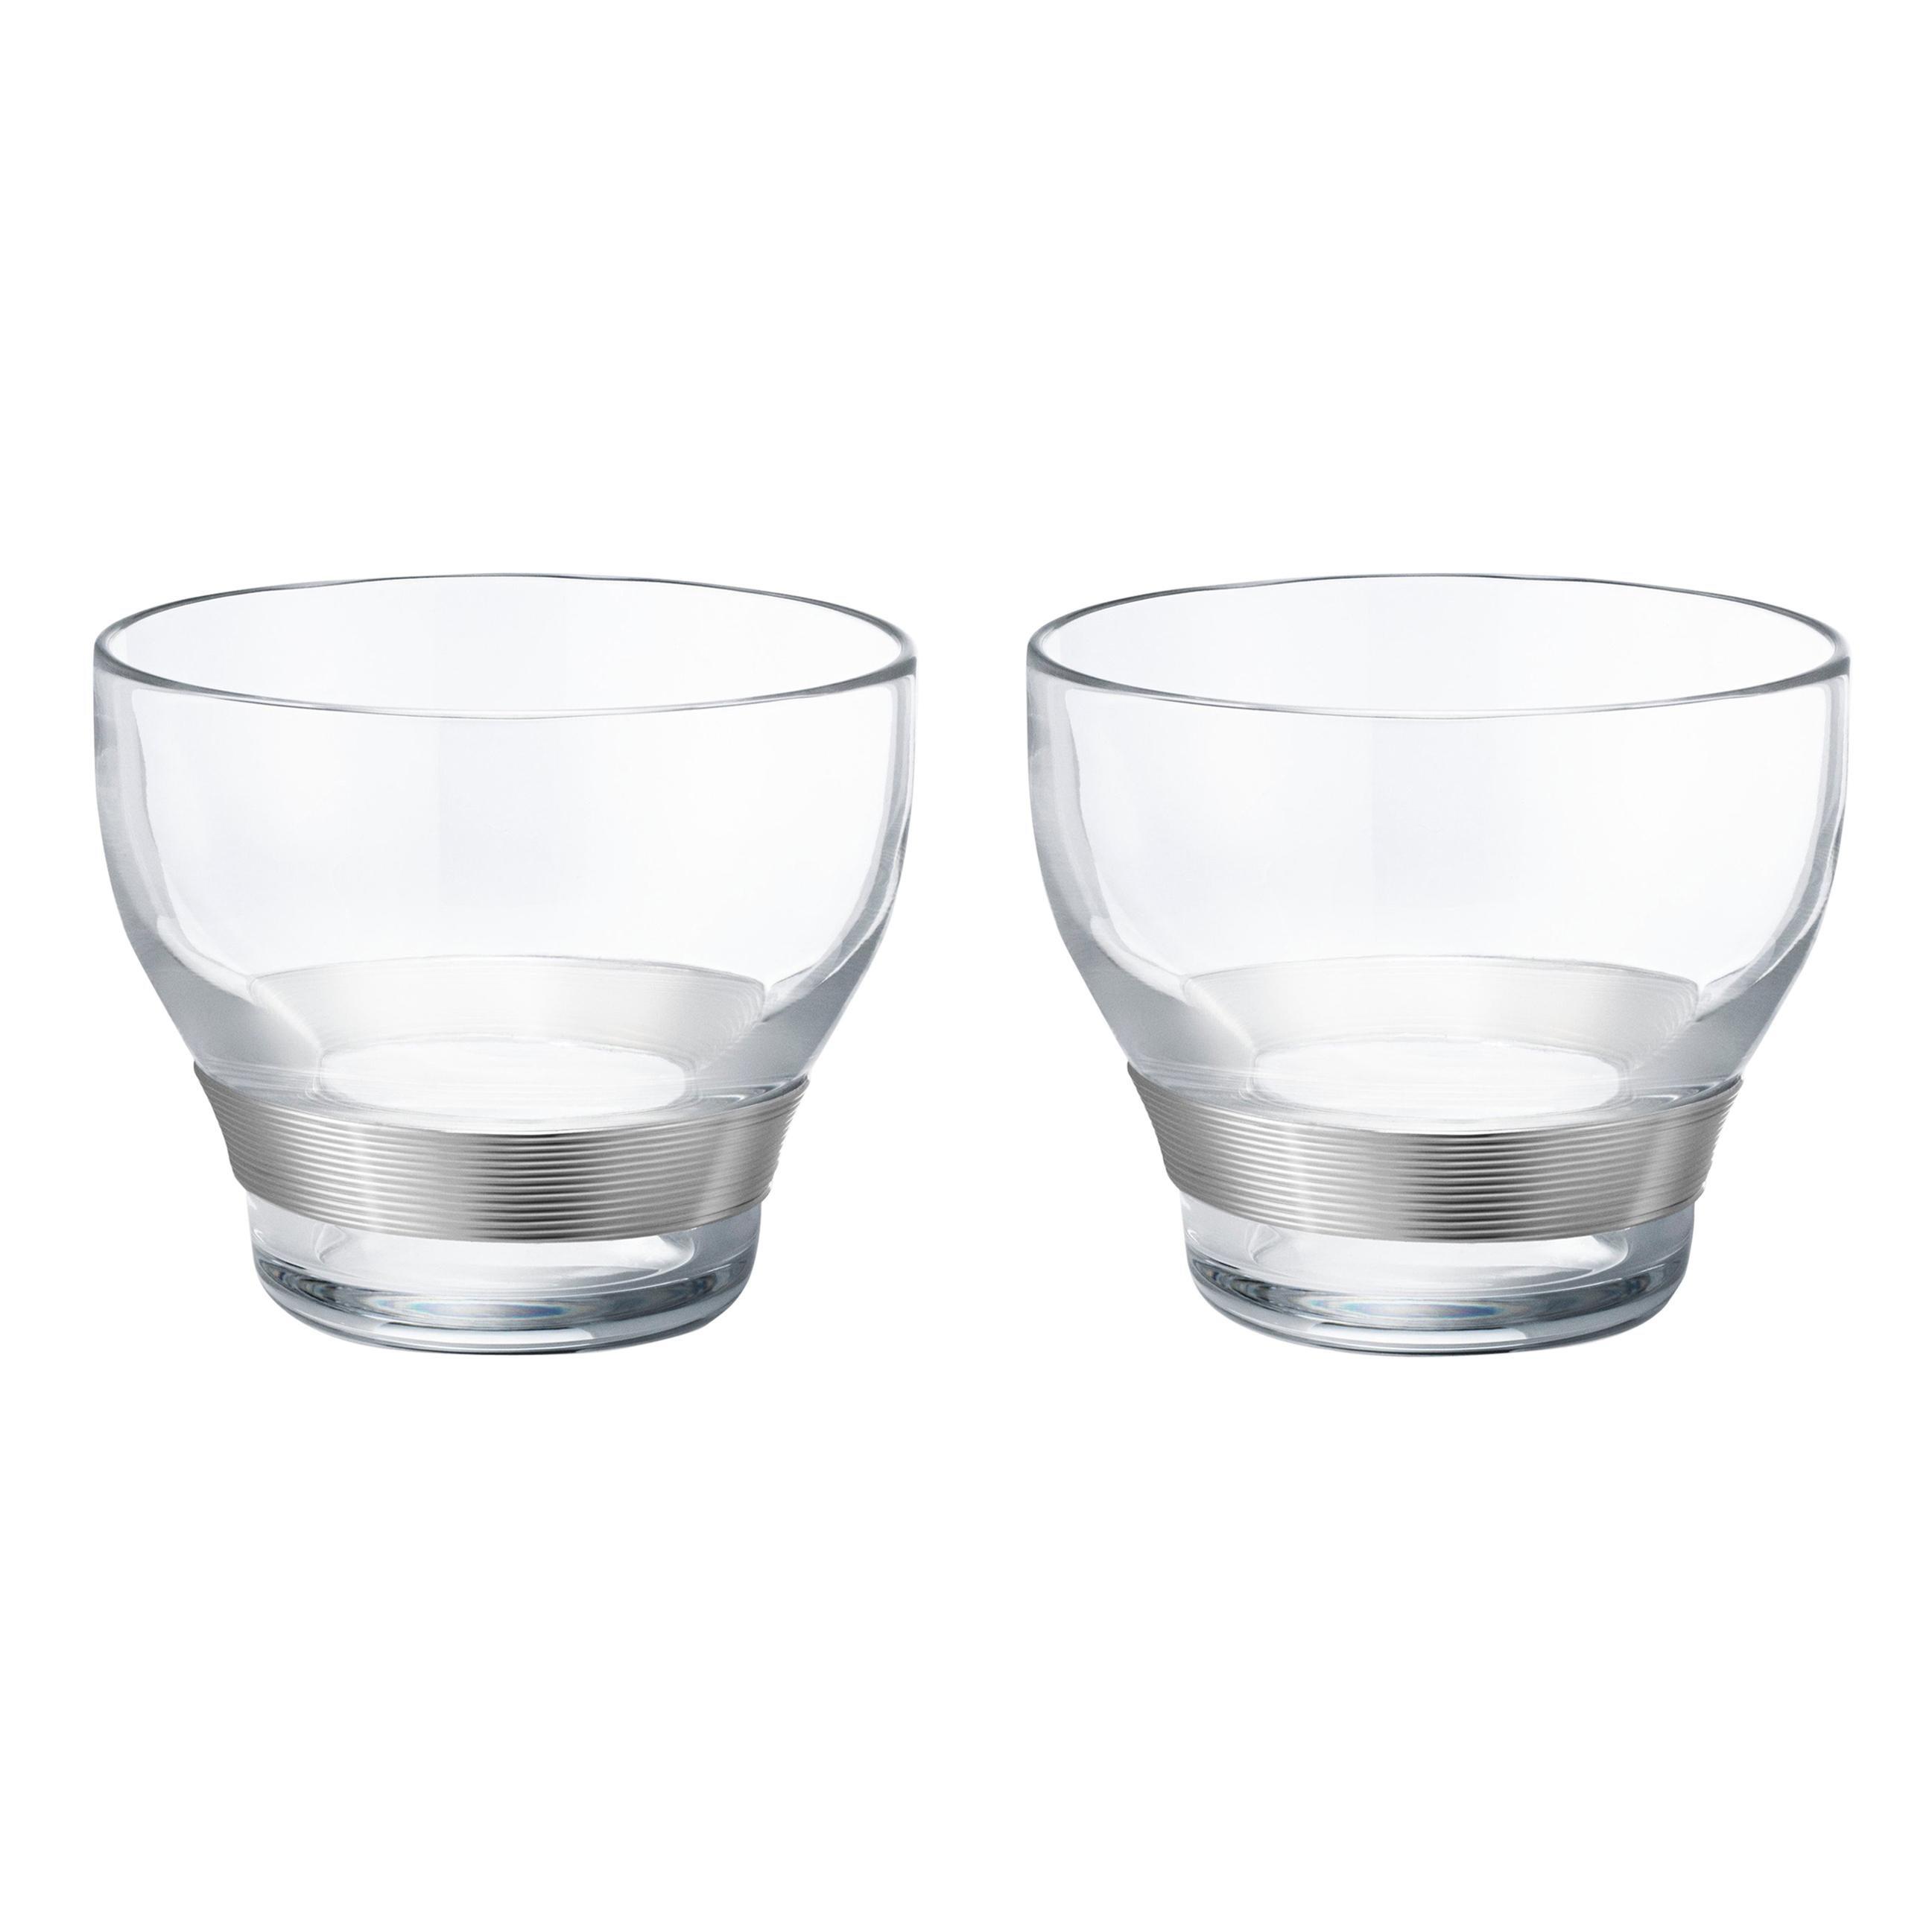 Georg Jensen Koppel Crystal Glass and Silver Two-Piece Glass Set, Henning Koppel